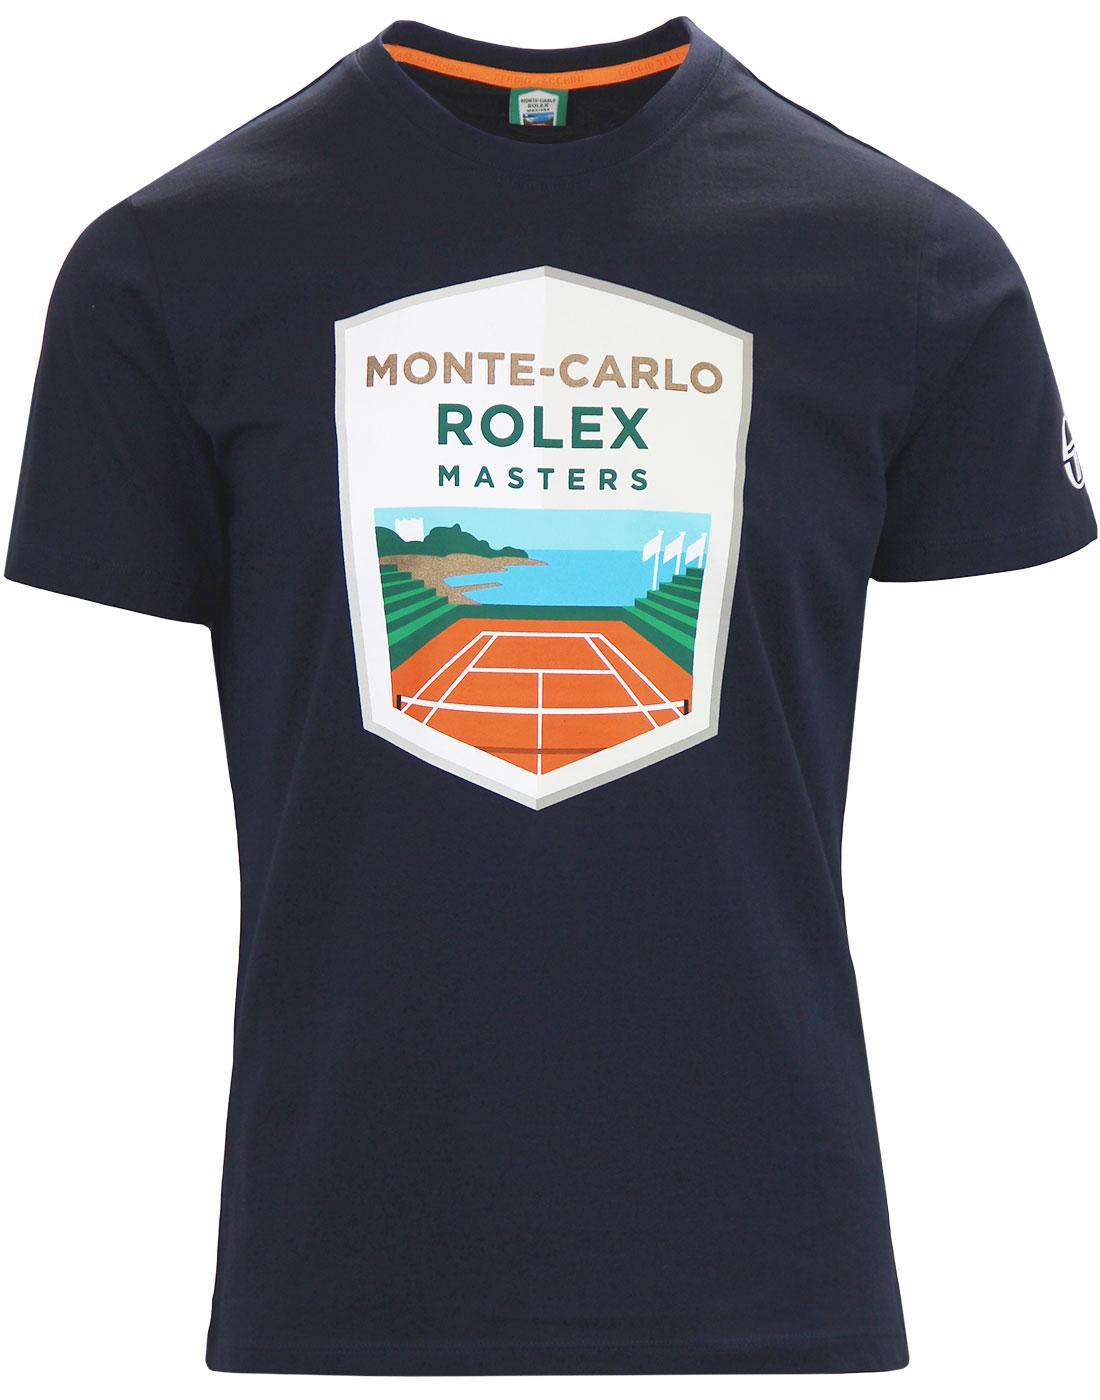 Virone SERGIO TACCHINI Monte Carlo Tennis T-Shirt